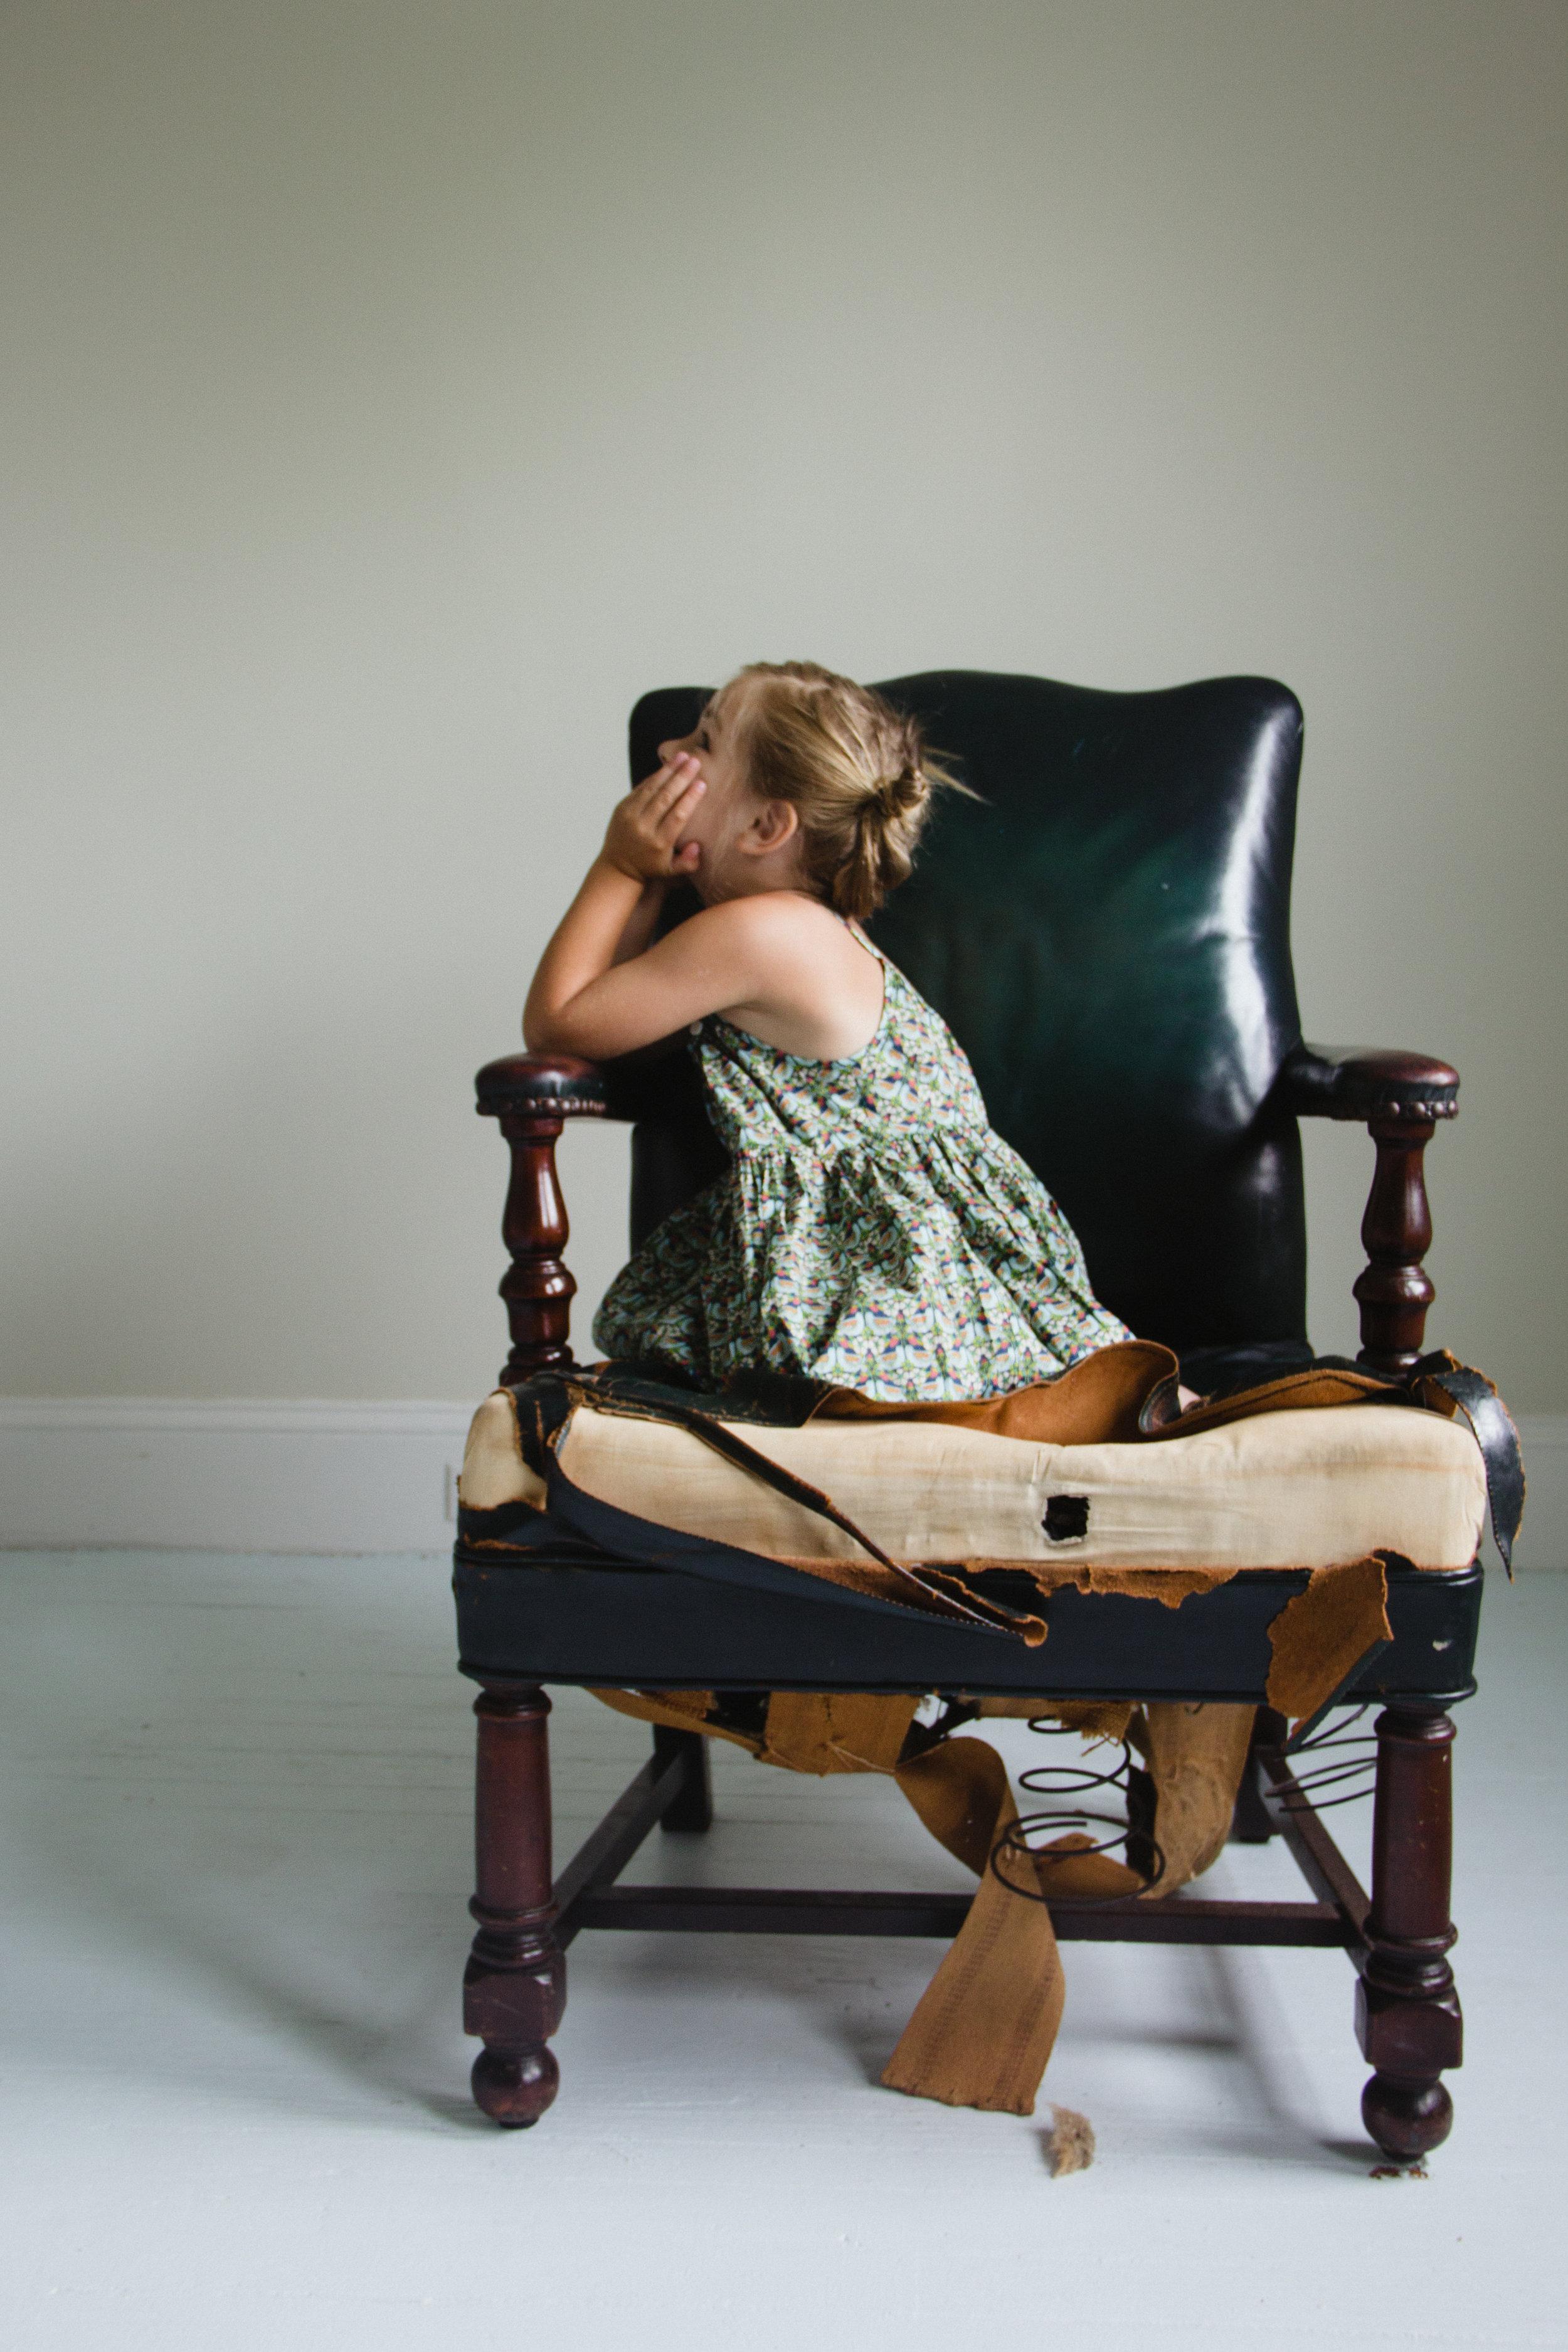 greenchair-8.jpg